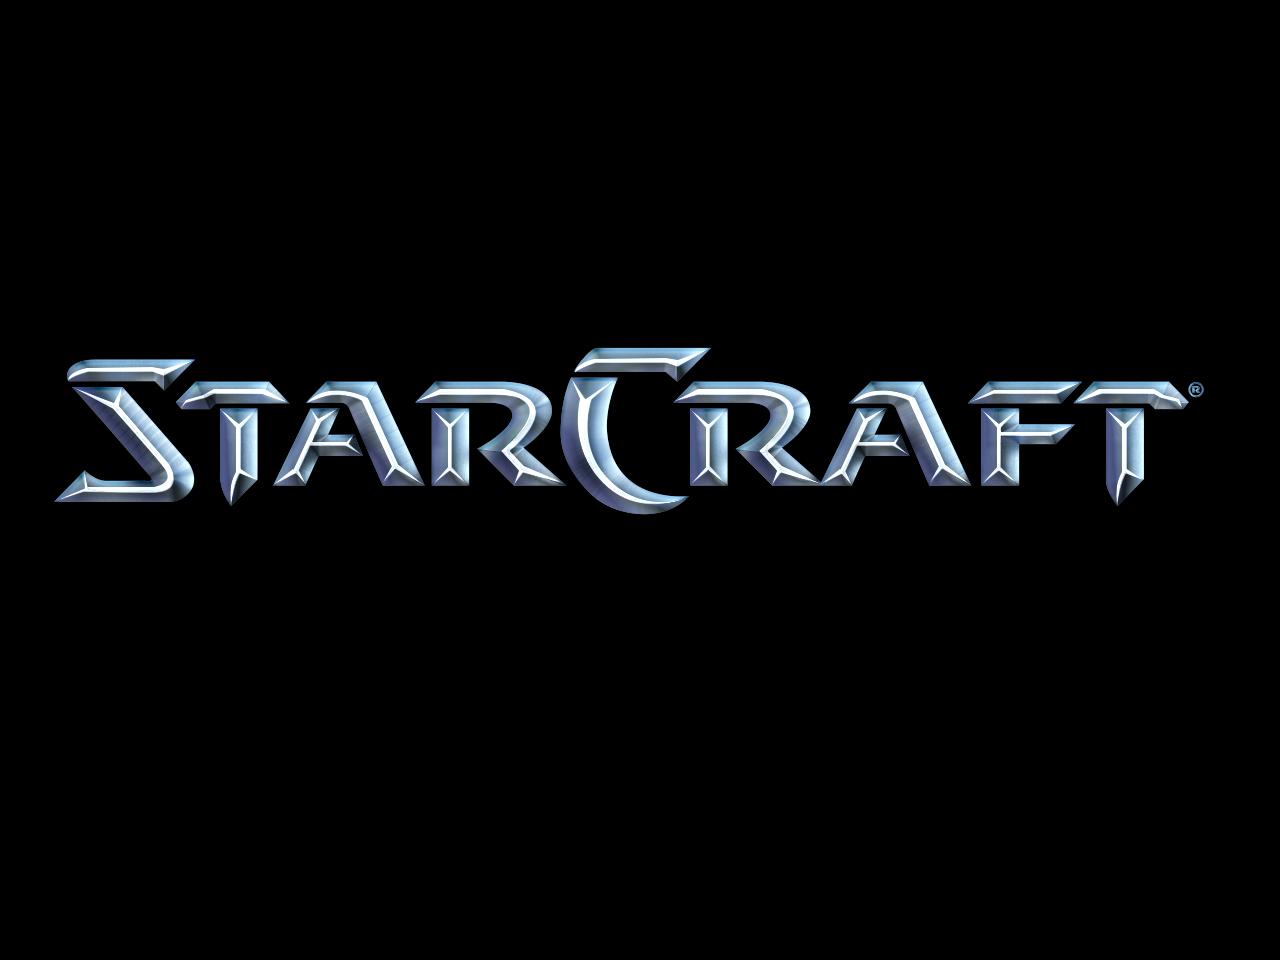 Warcraft Movie Logo Revealed Warcraft Movie Starcraft Logo Reveal